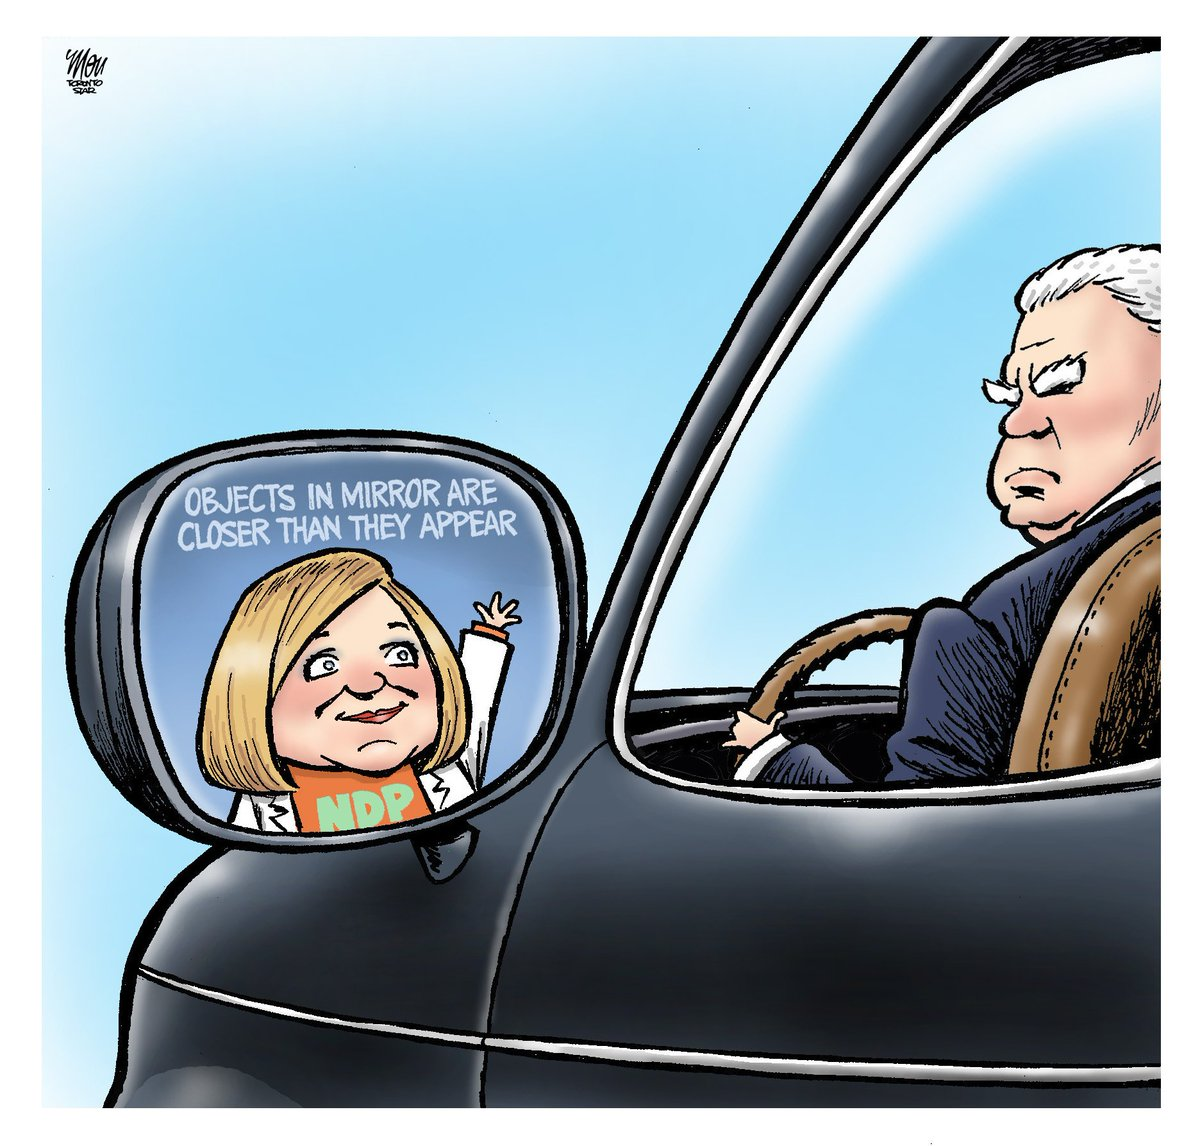 Here's Tuesday's #onpoli cartoon in @TorontoStar #OntarioElection2018